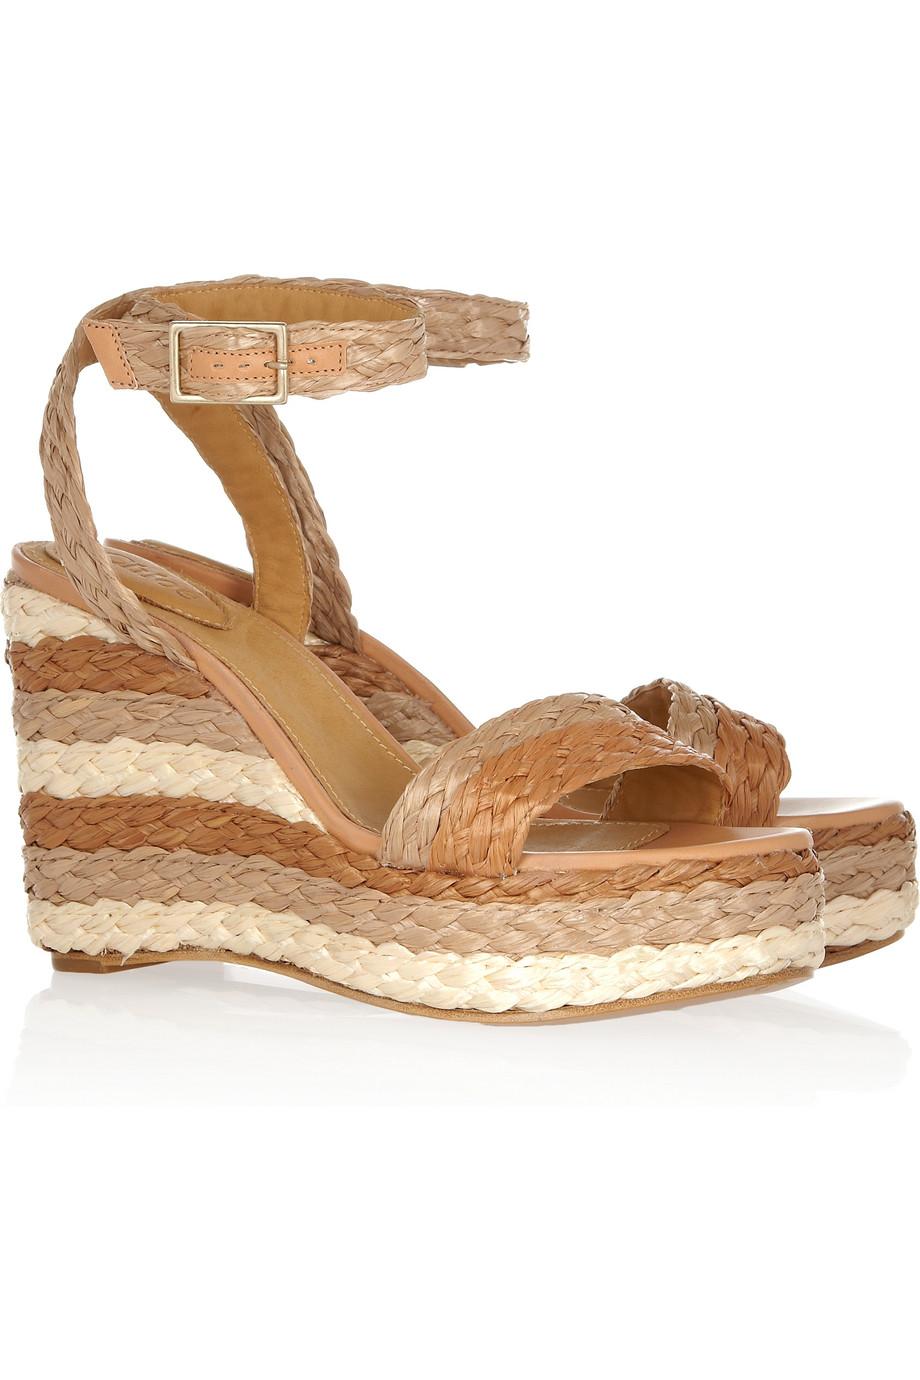 3ef2ffc0338 Lyst - Chloé Halter Ankle Raffia Wedge Sandal in Brown